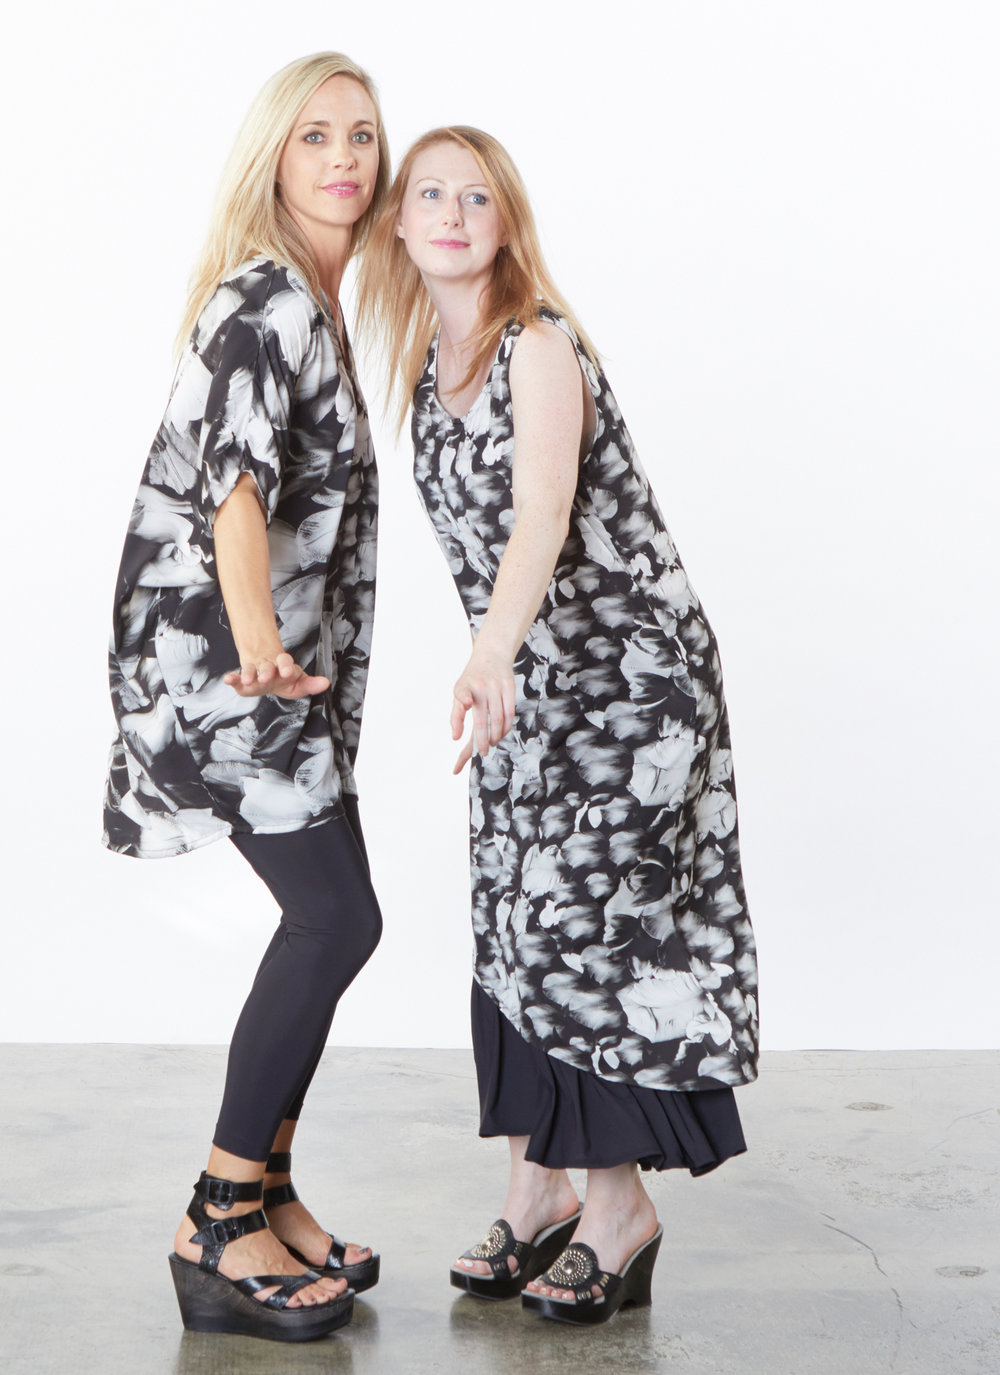 Raquel Tunic, Euna Dress in Black Tulip Print, Legging, Ruffle Pant in Black Microfiber Jersey